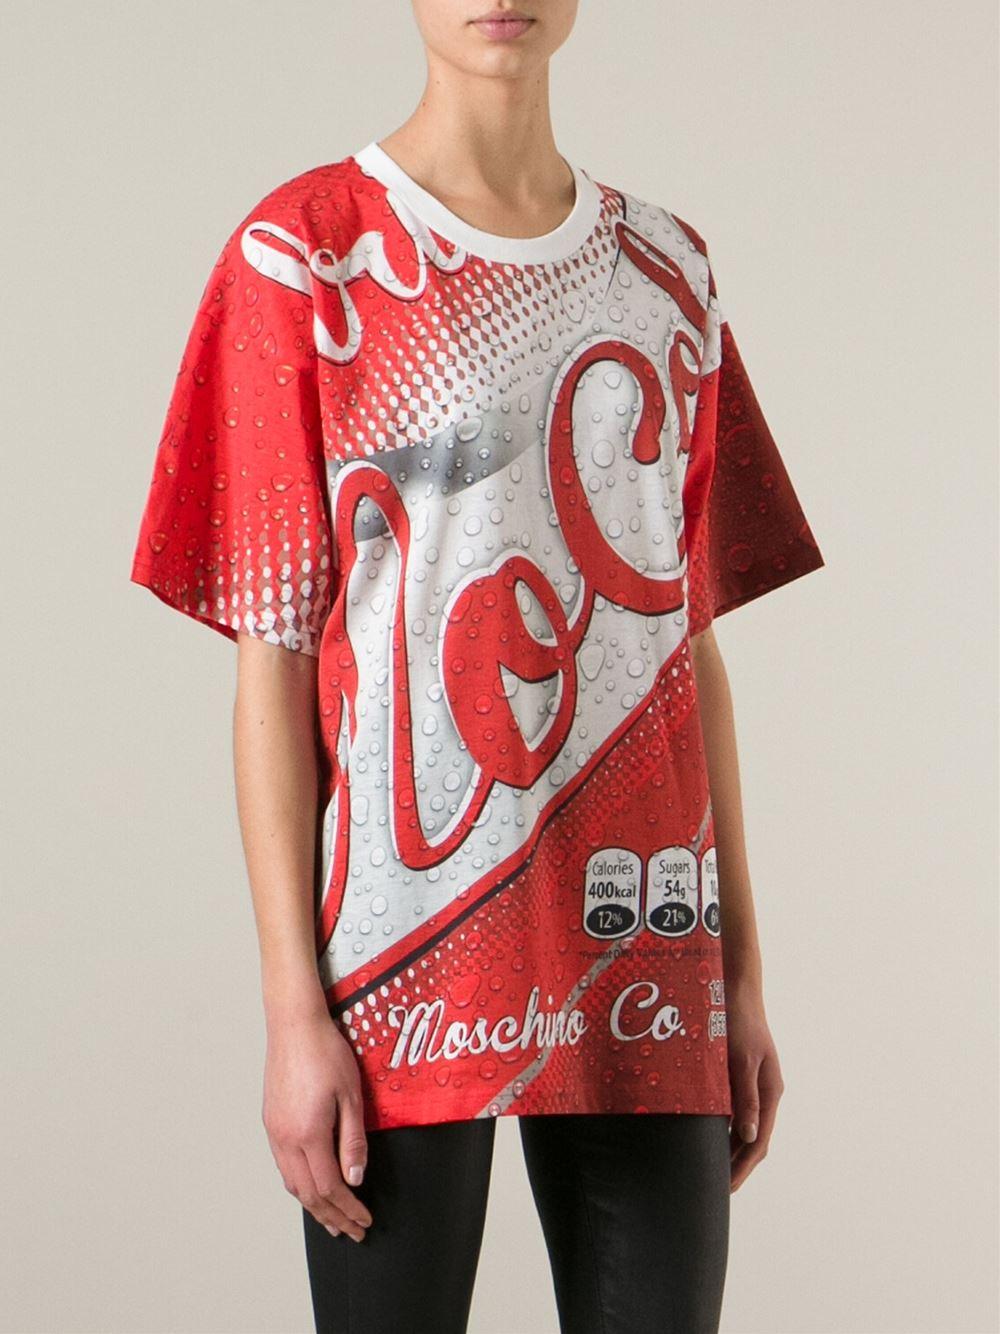 Coca cola shirt girls